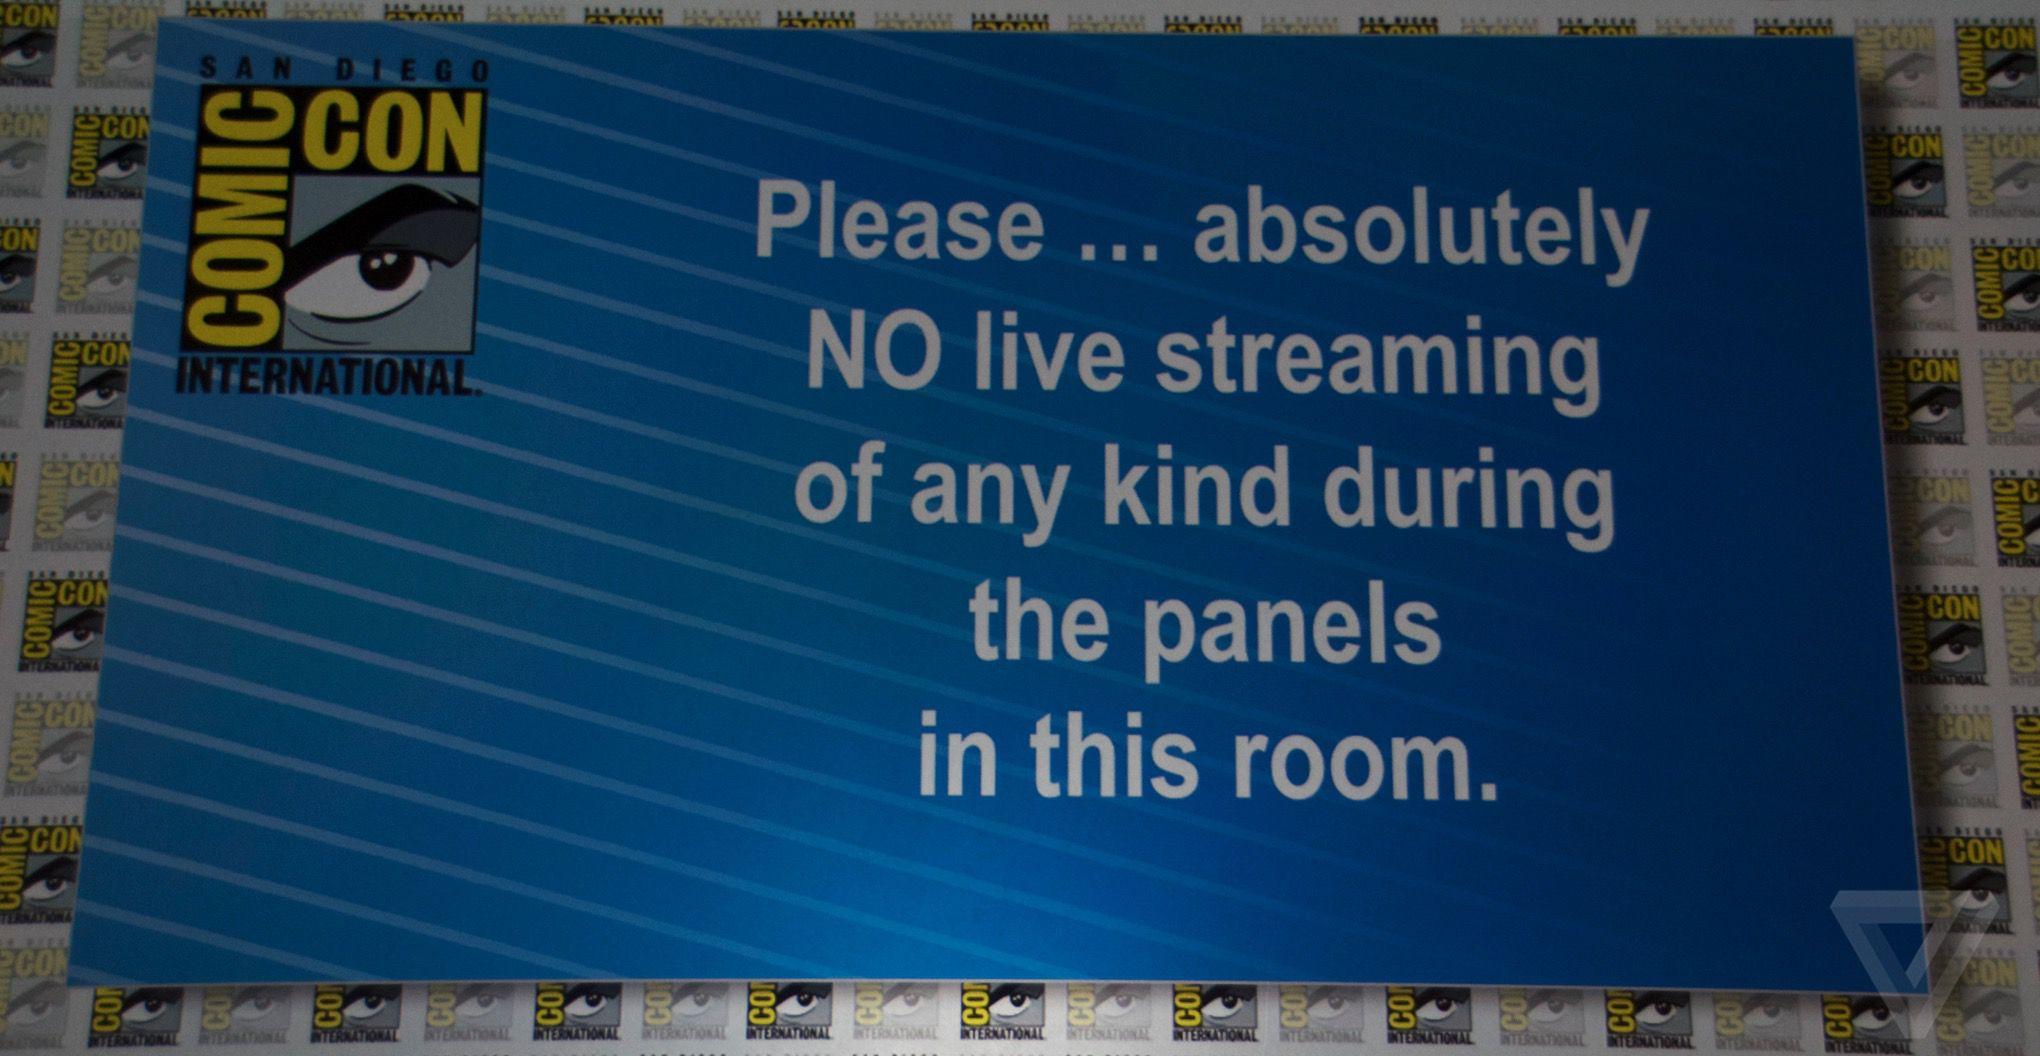 San Diego Comic-Con no streaming sign